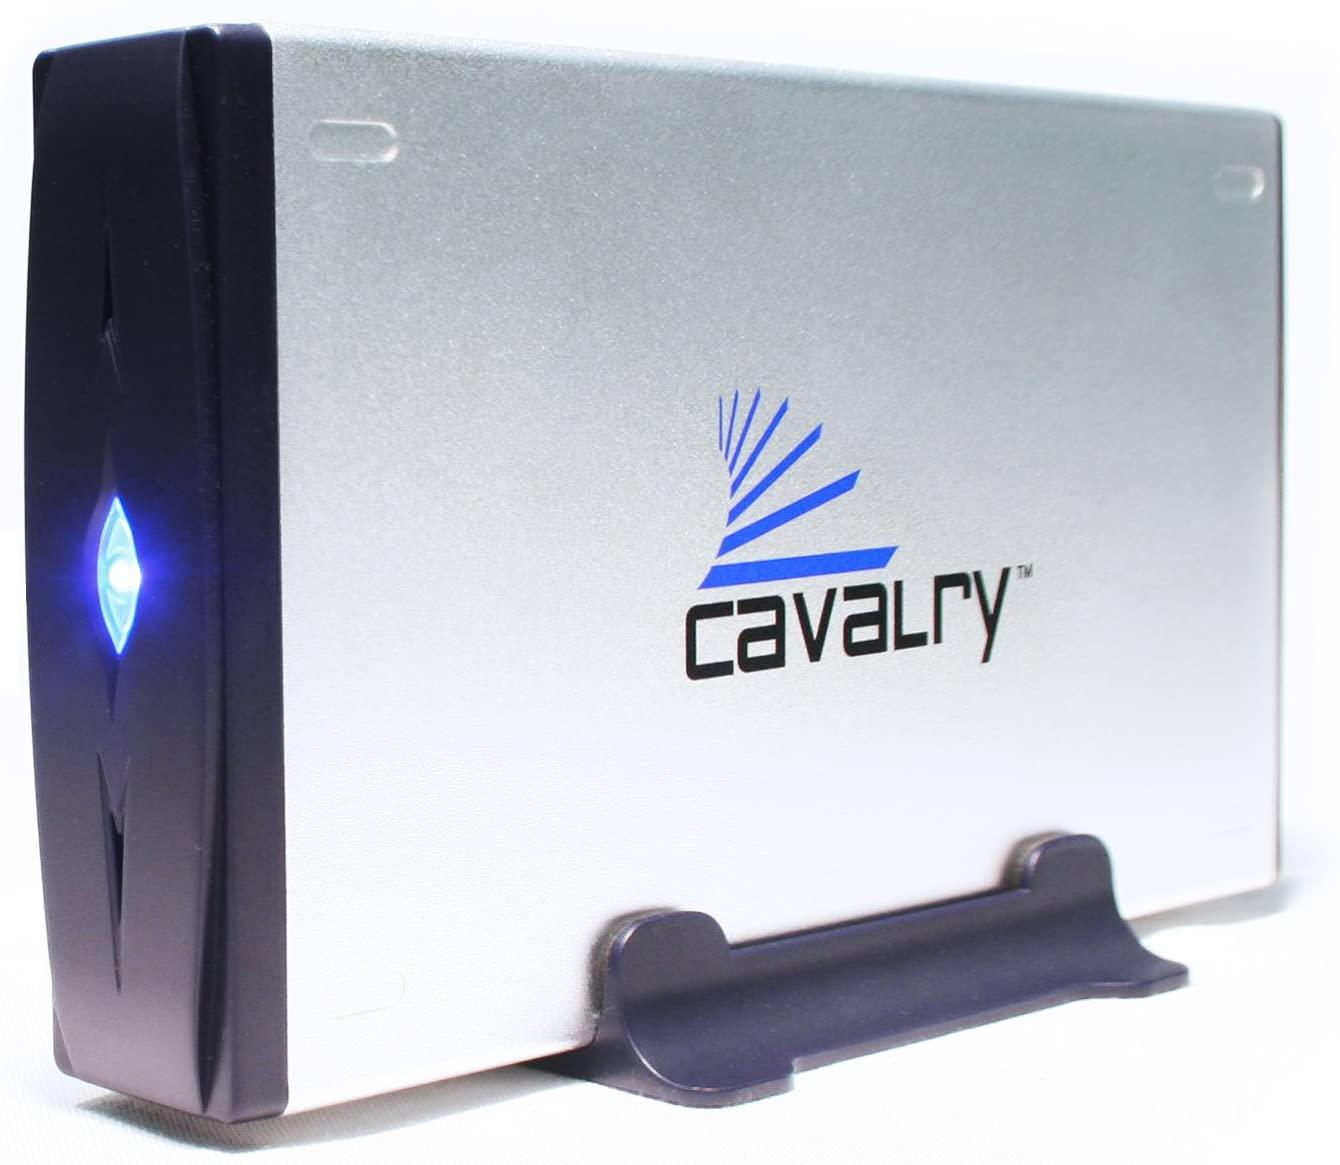 Cavalry Storage CACE Series 1 TB USB/Firewire 800 Mac-Ready External Hard Drive CACE3701T0